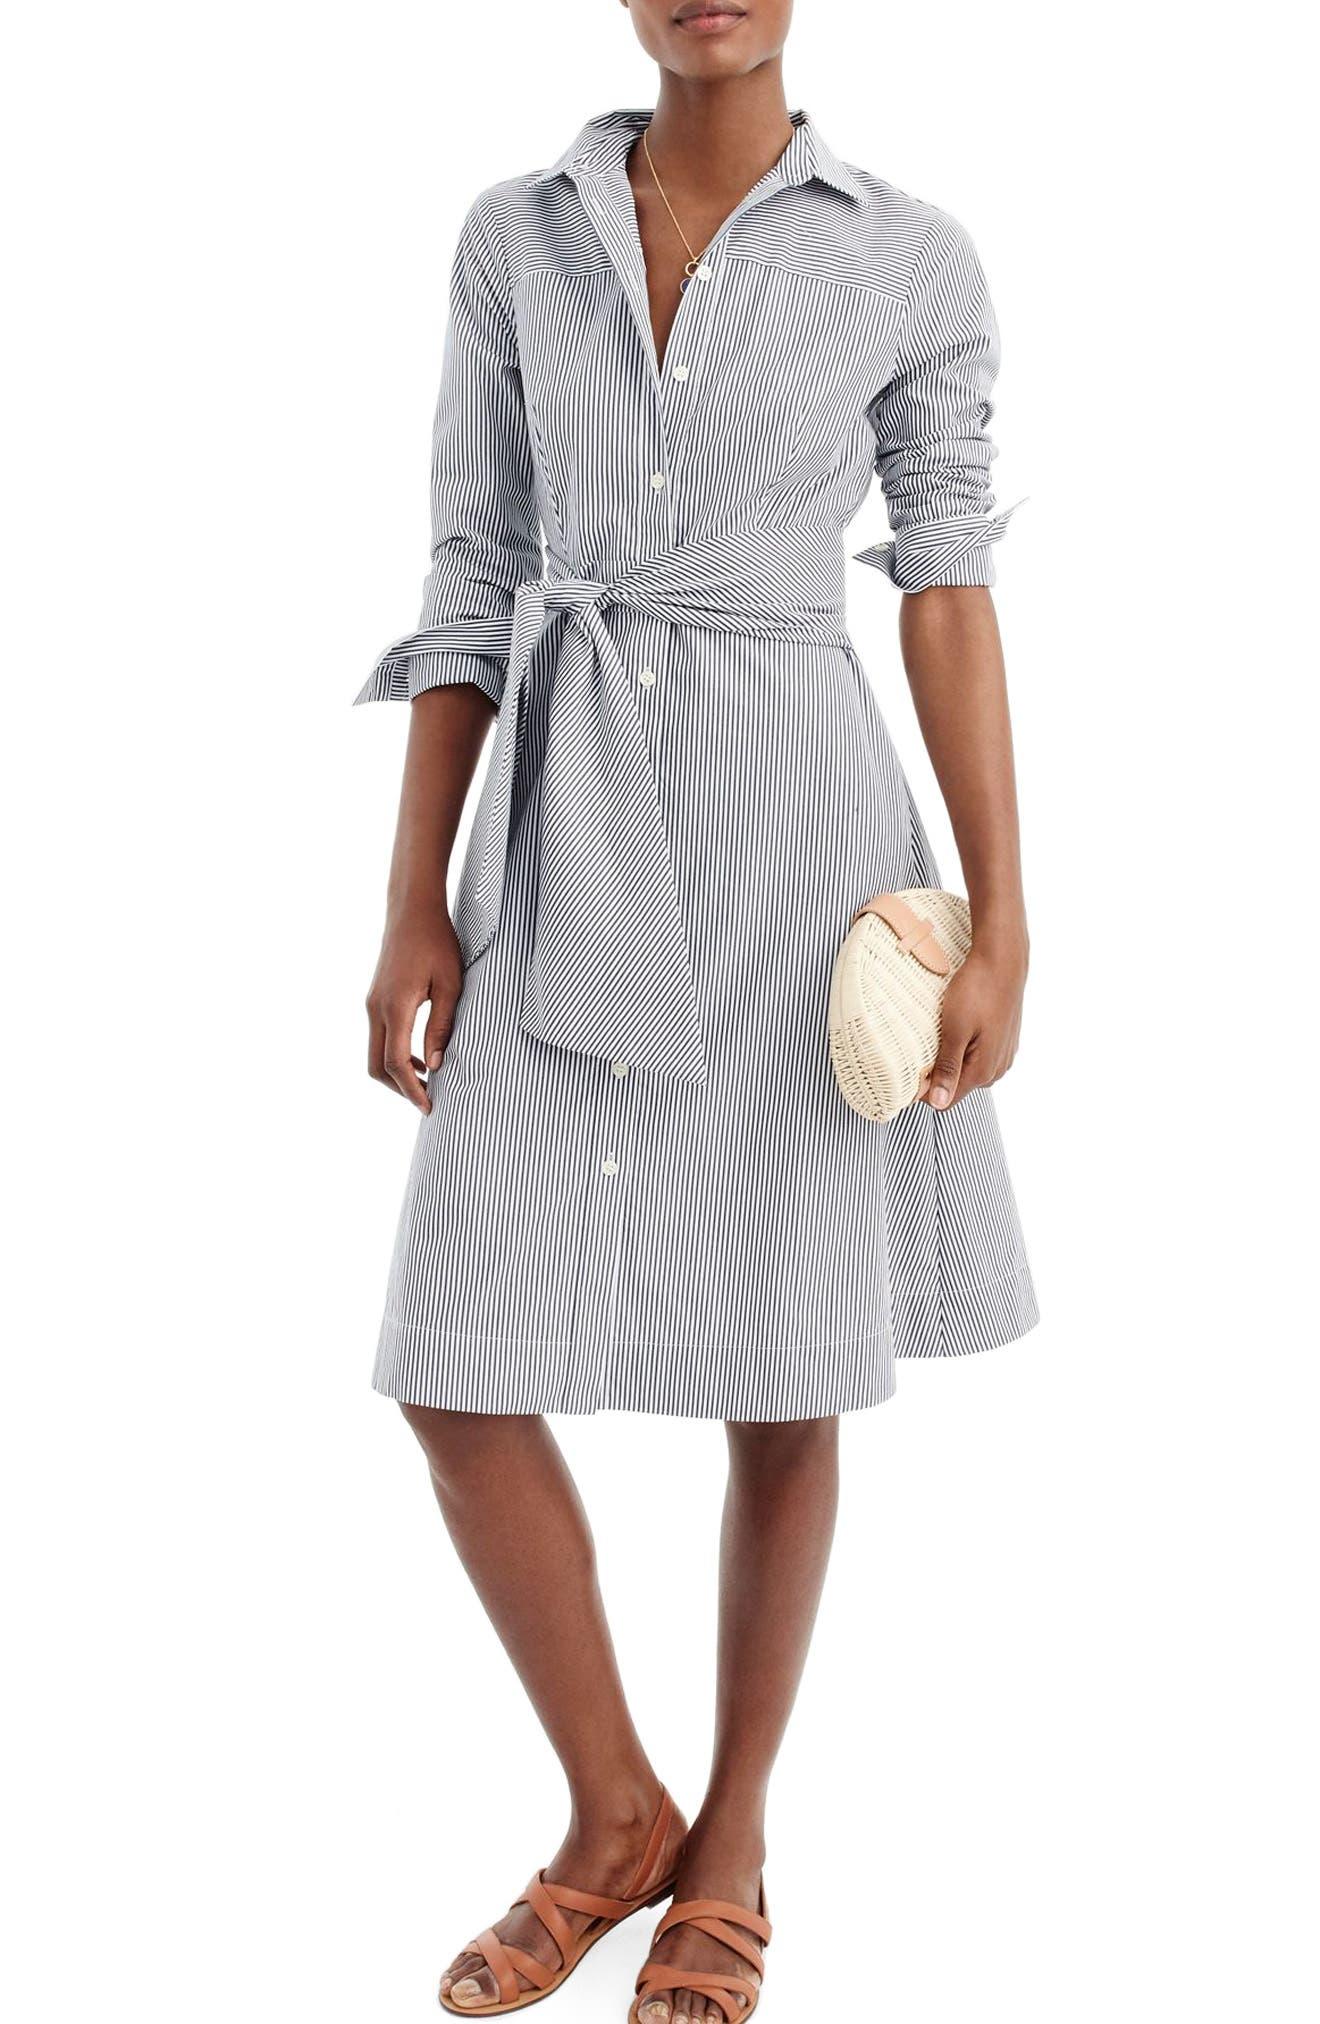 Maribou Stripe Cotton Shirtdress,                         Main,                         color, White Navy